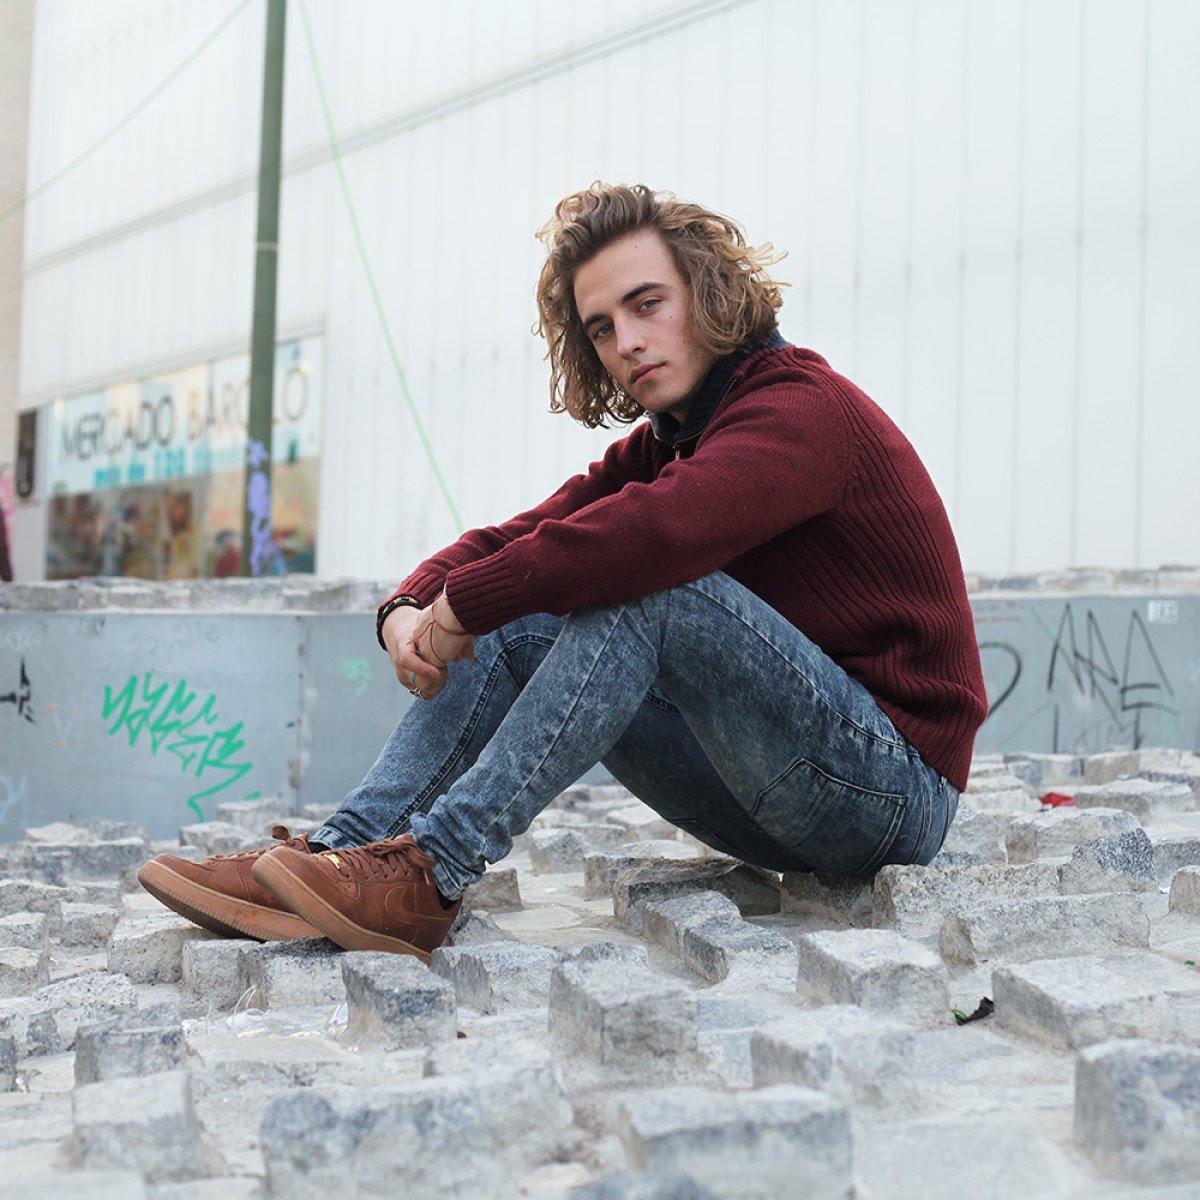 Descubre a Manel Navarro a través de sus mejores fotos